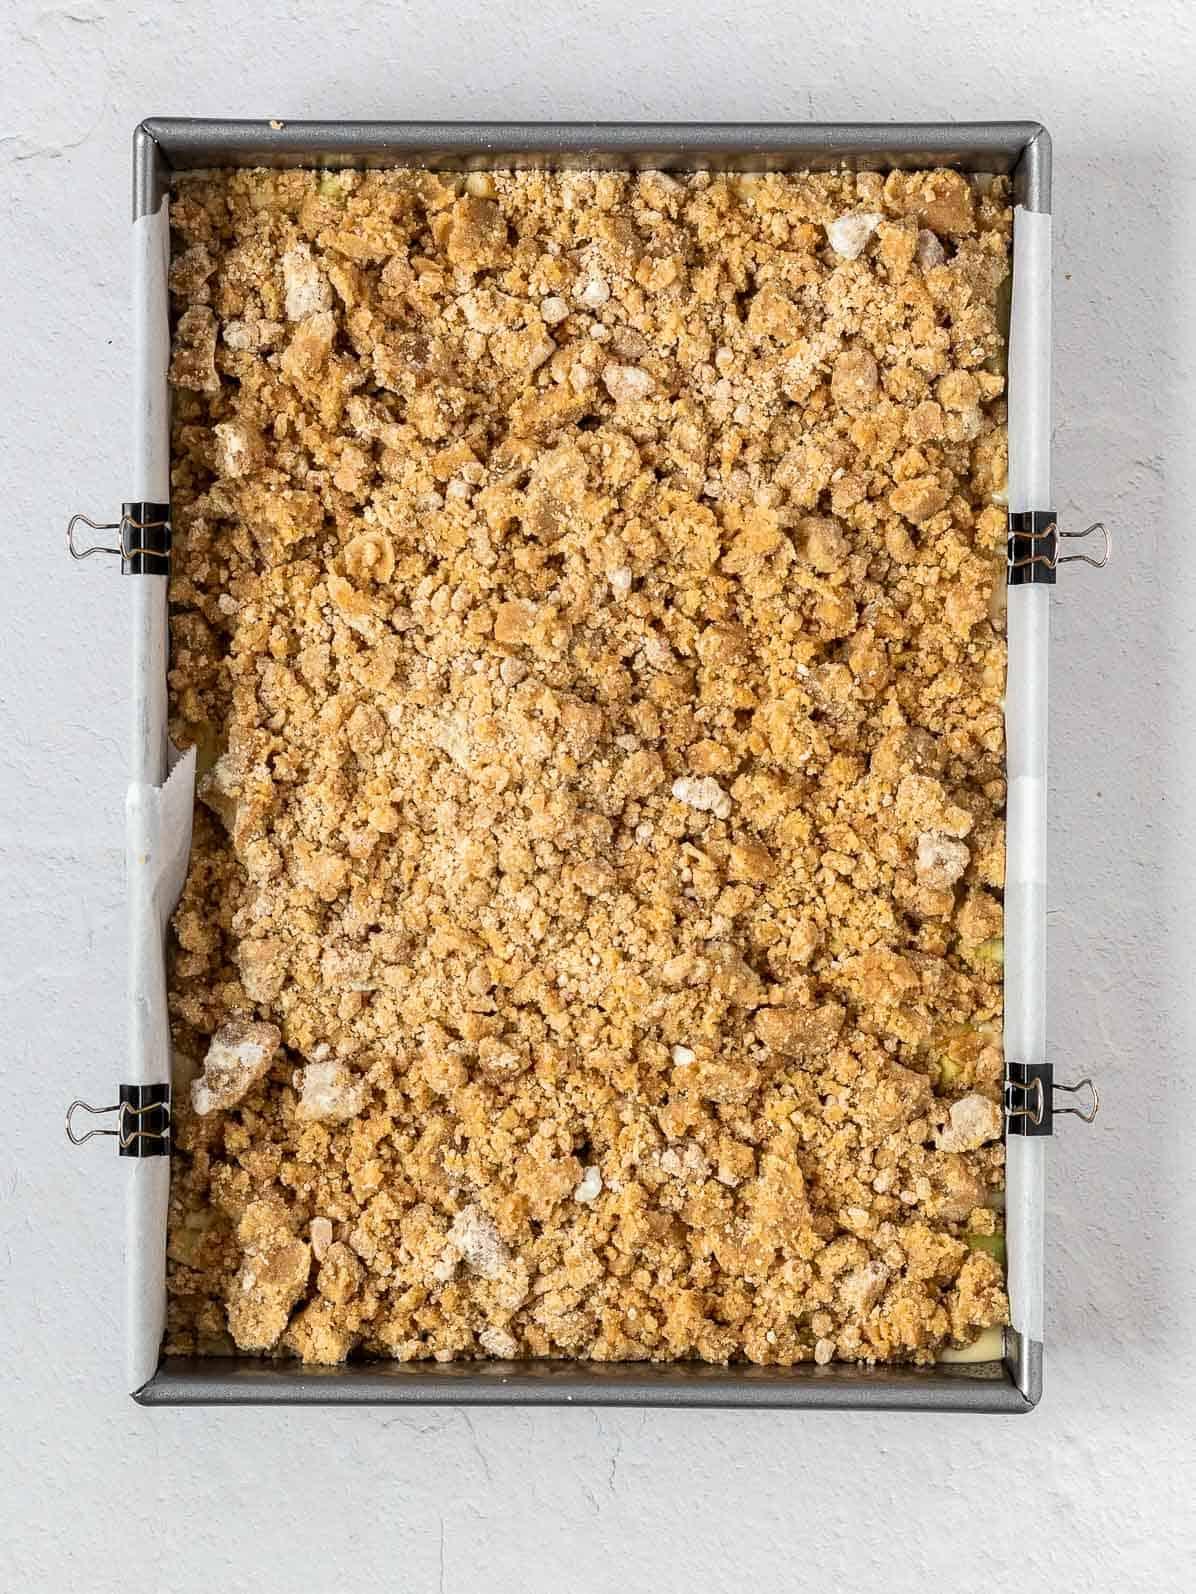 apple crumb cake before baking in a rectangular pan